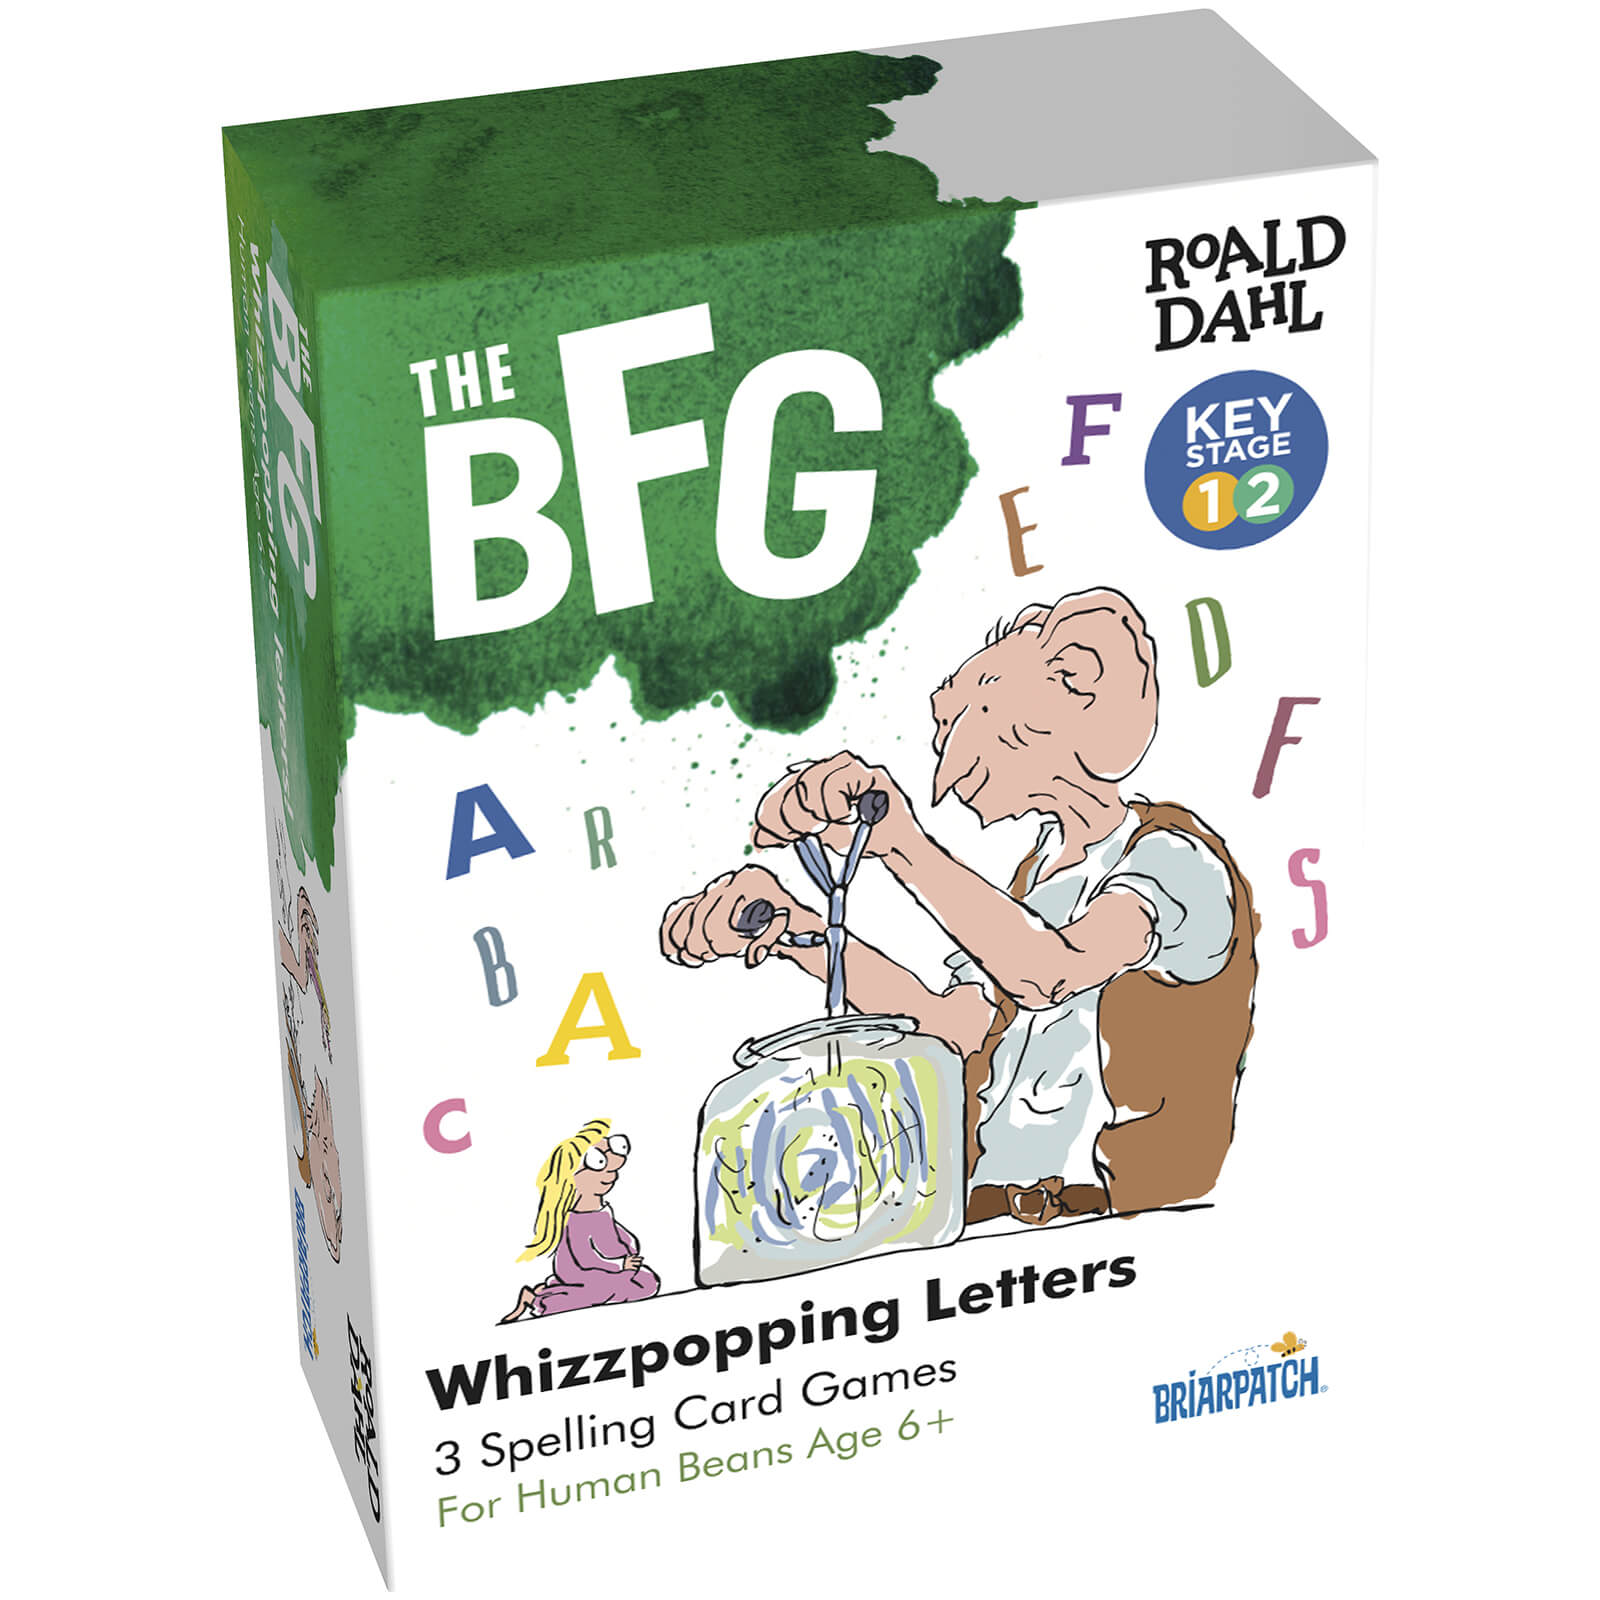 Image of Roald Dahl BFG Spelling Educational Games